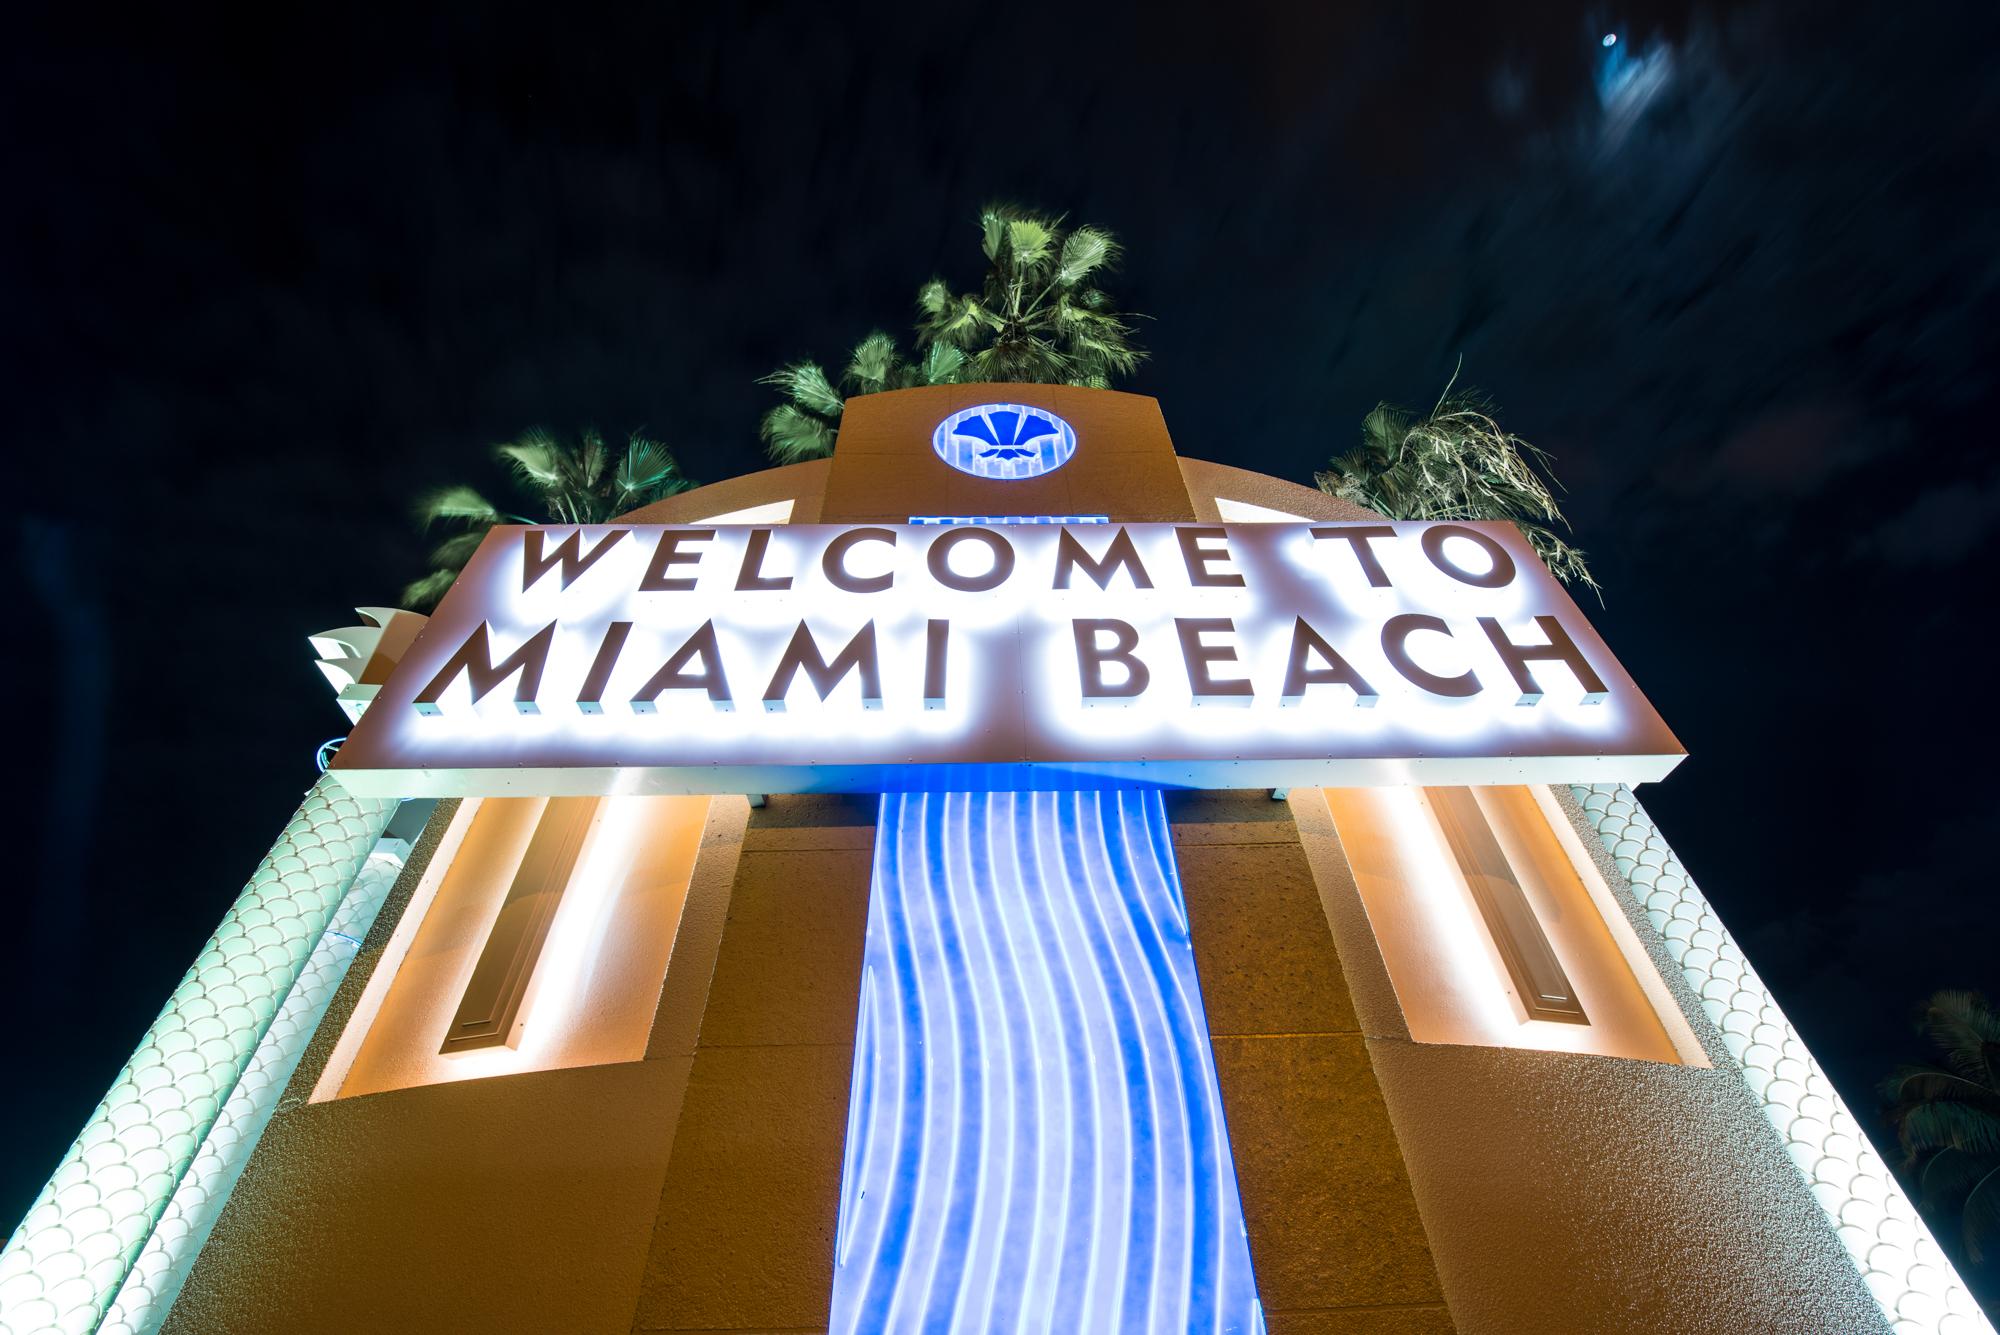 Welcome To Miami Beach, USA